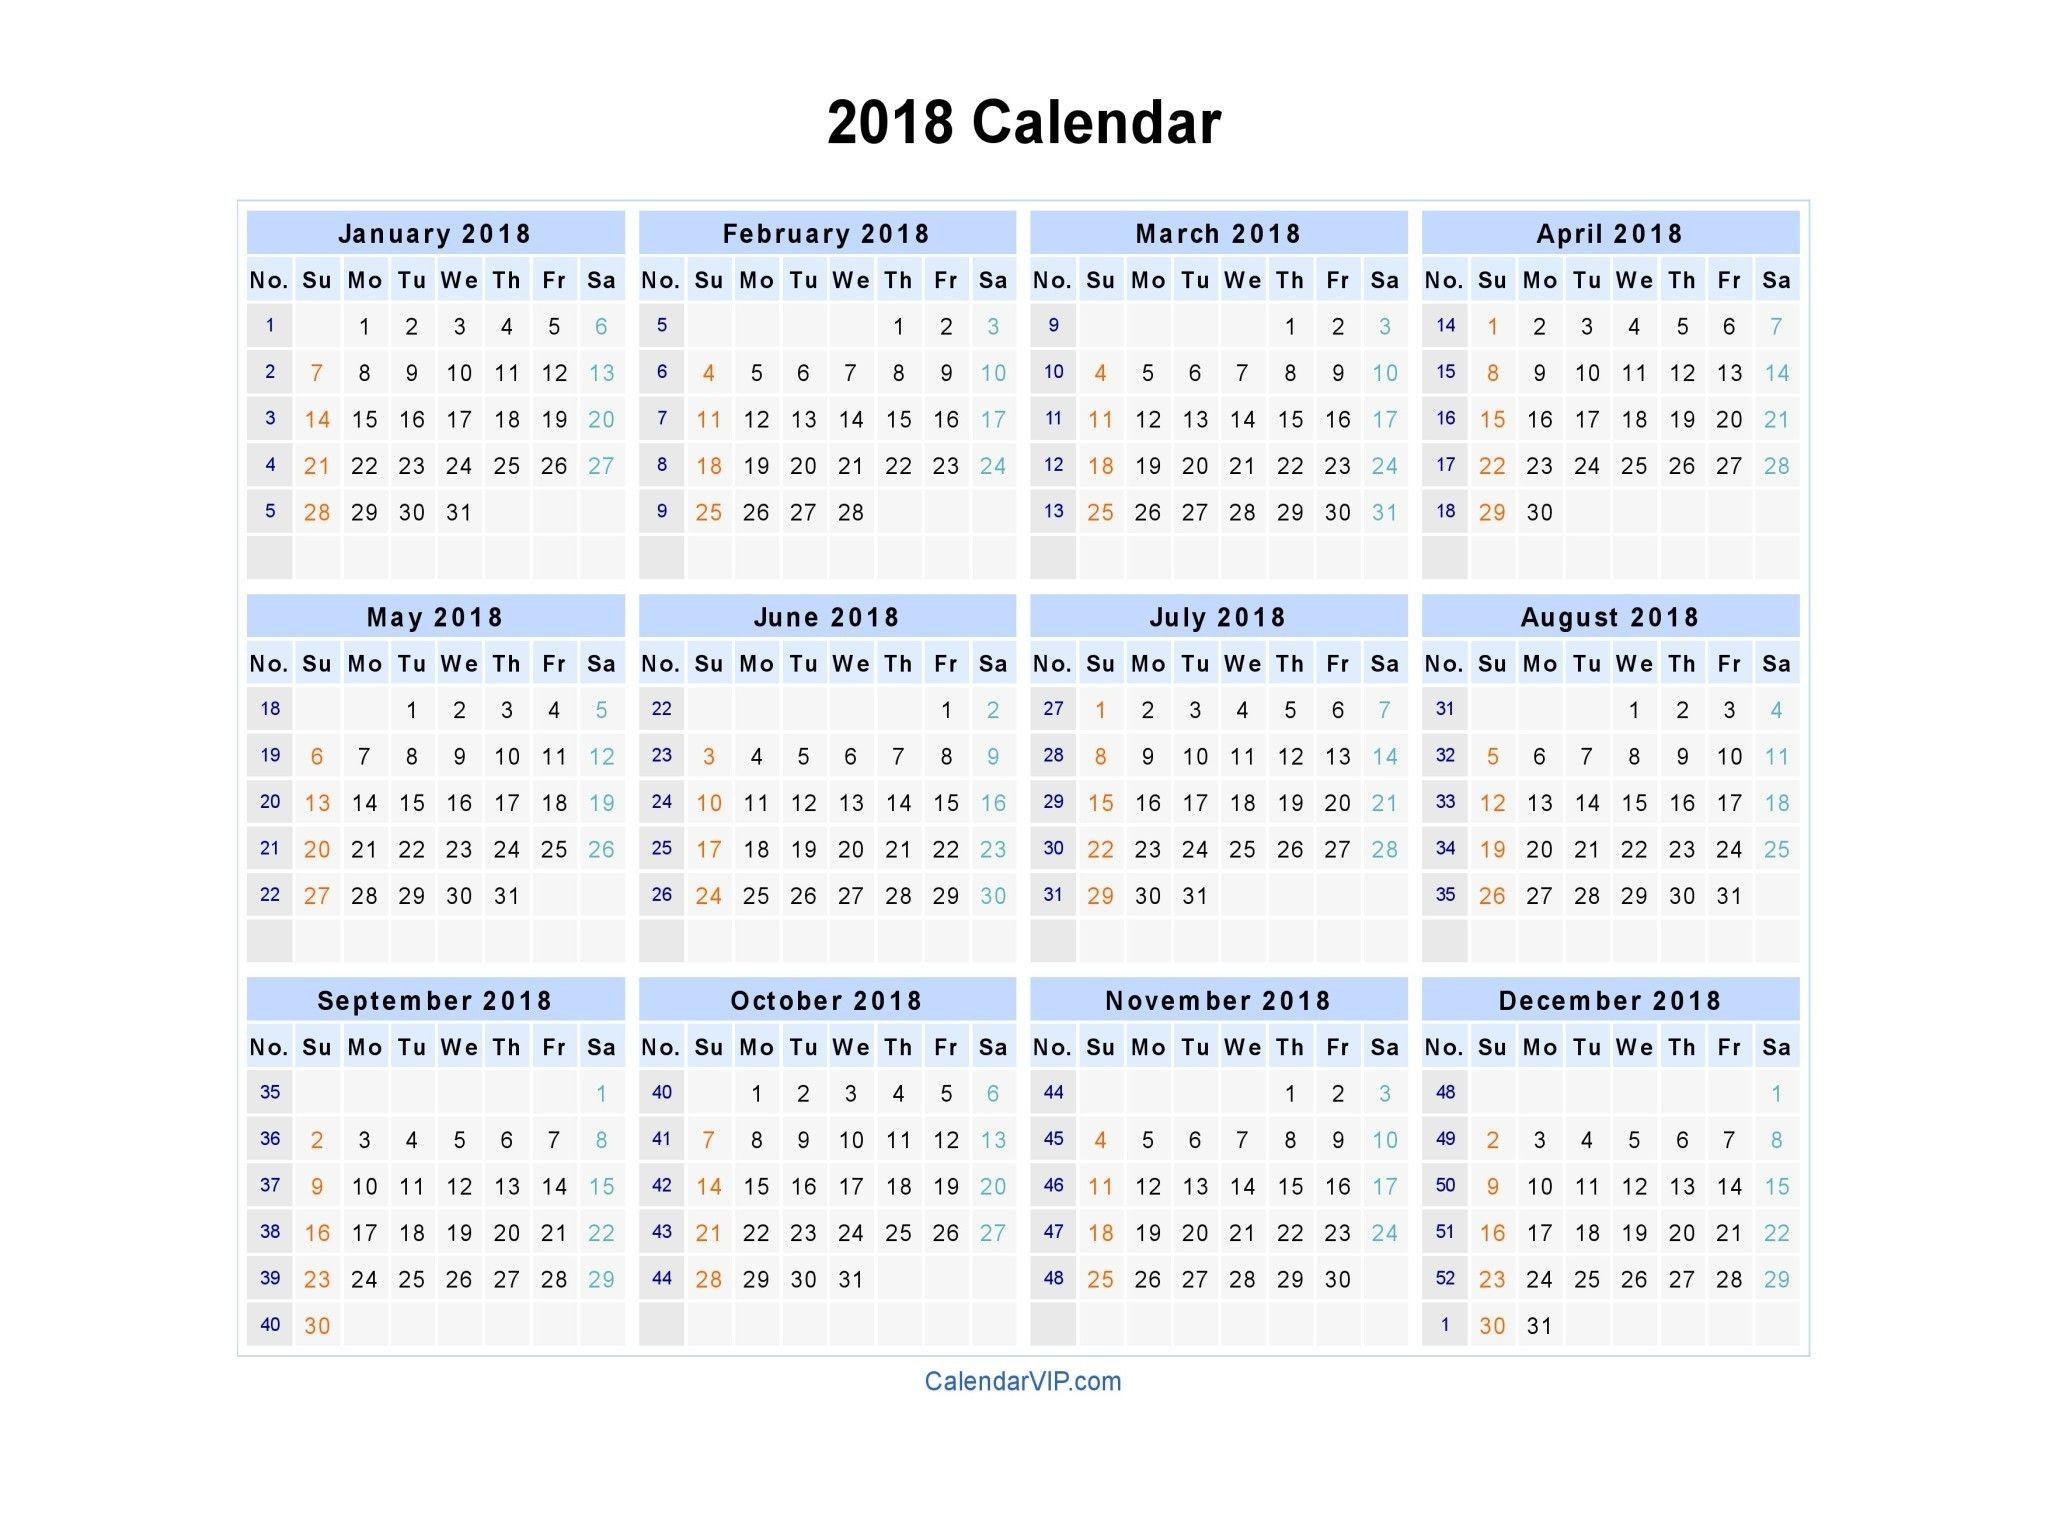 Calendar 2018 and 2019 In Excel Spreadsheet Calendar 2018 Juve Cenitdelacabrera Calendar 2018 and 2019